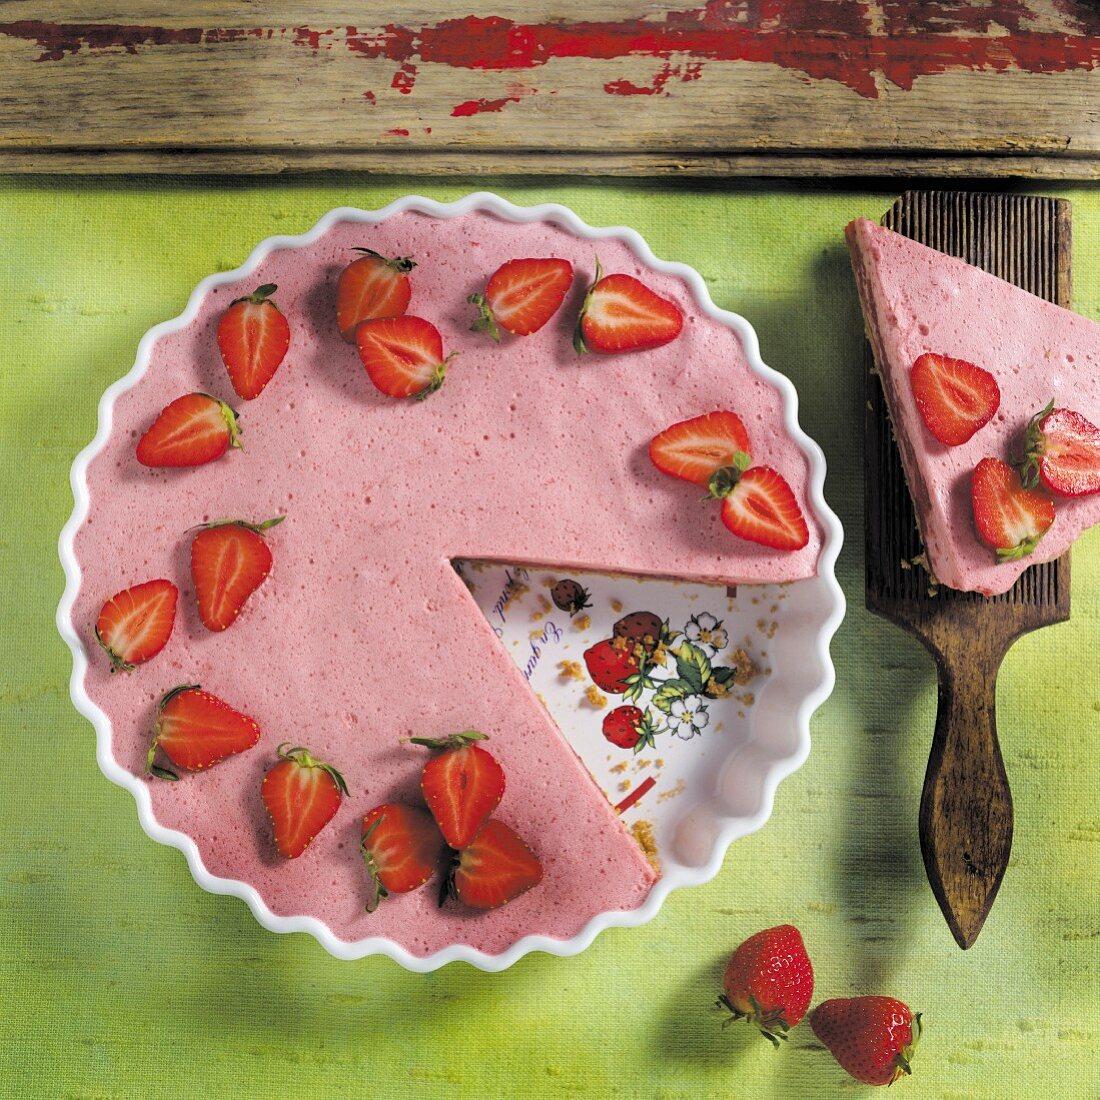 Strawberry cake, sliced